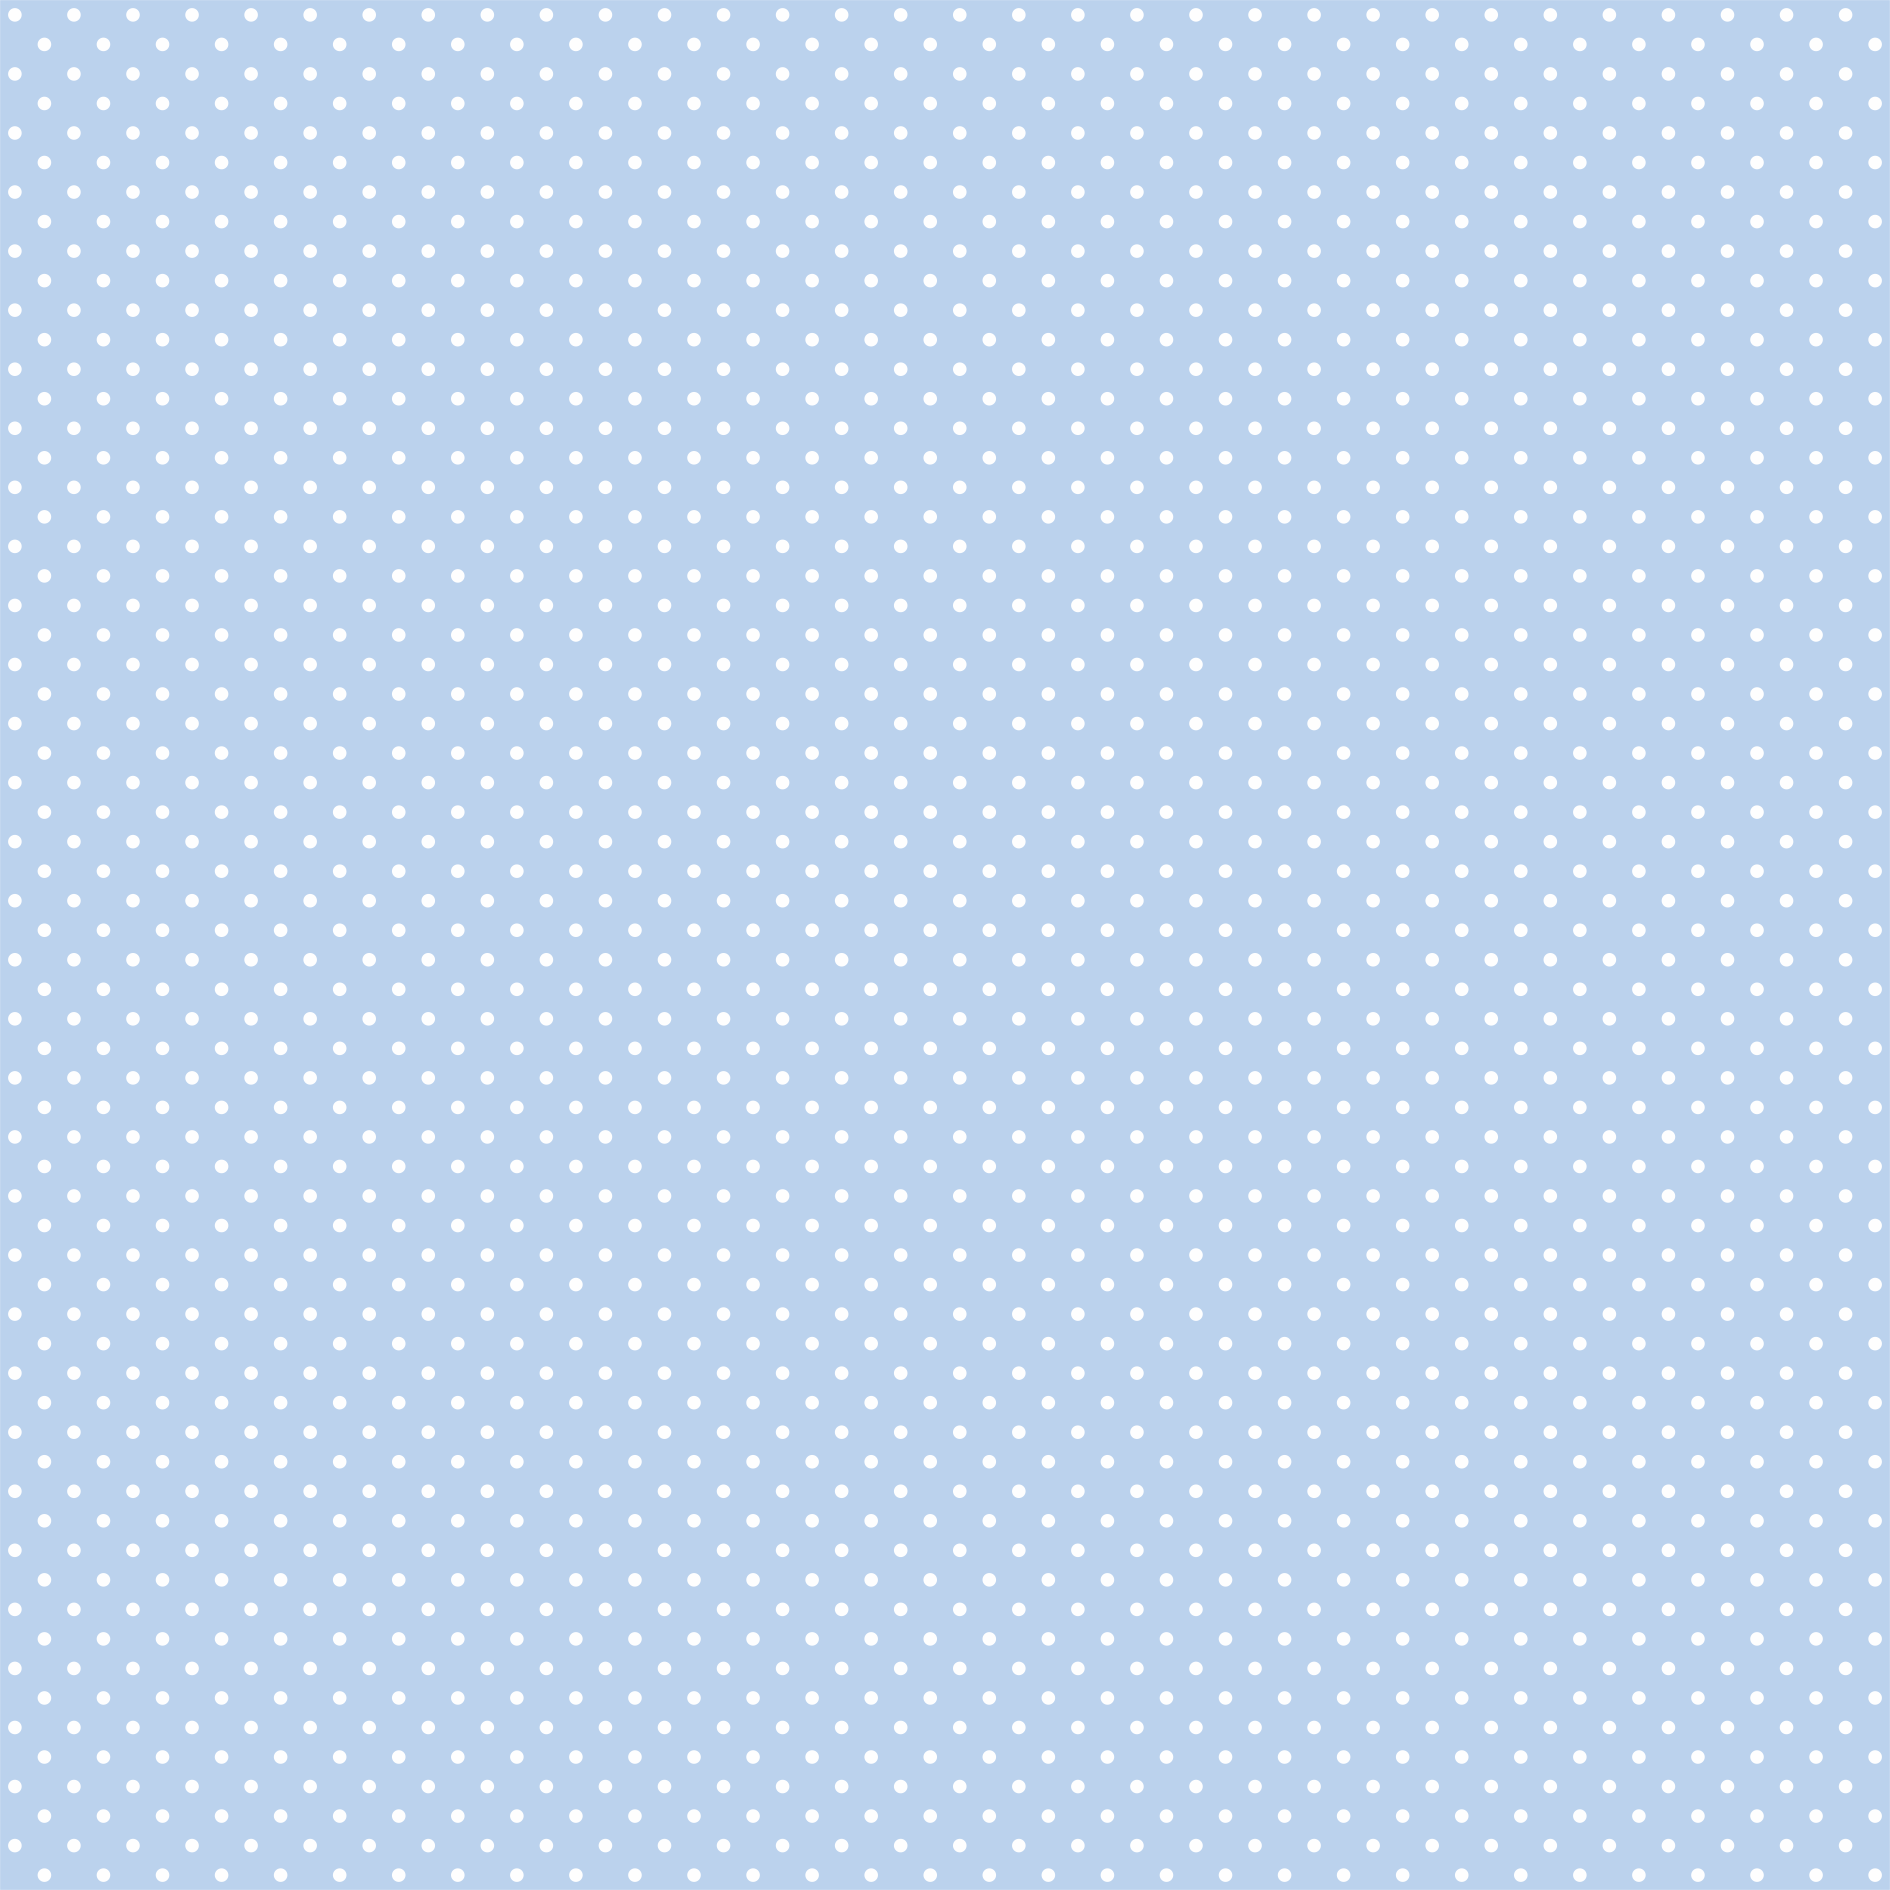 Tecido Tricoline estampado Mini Poá branco fundo azul claro